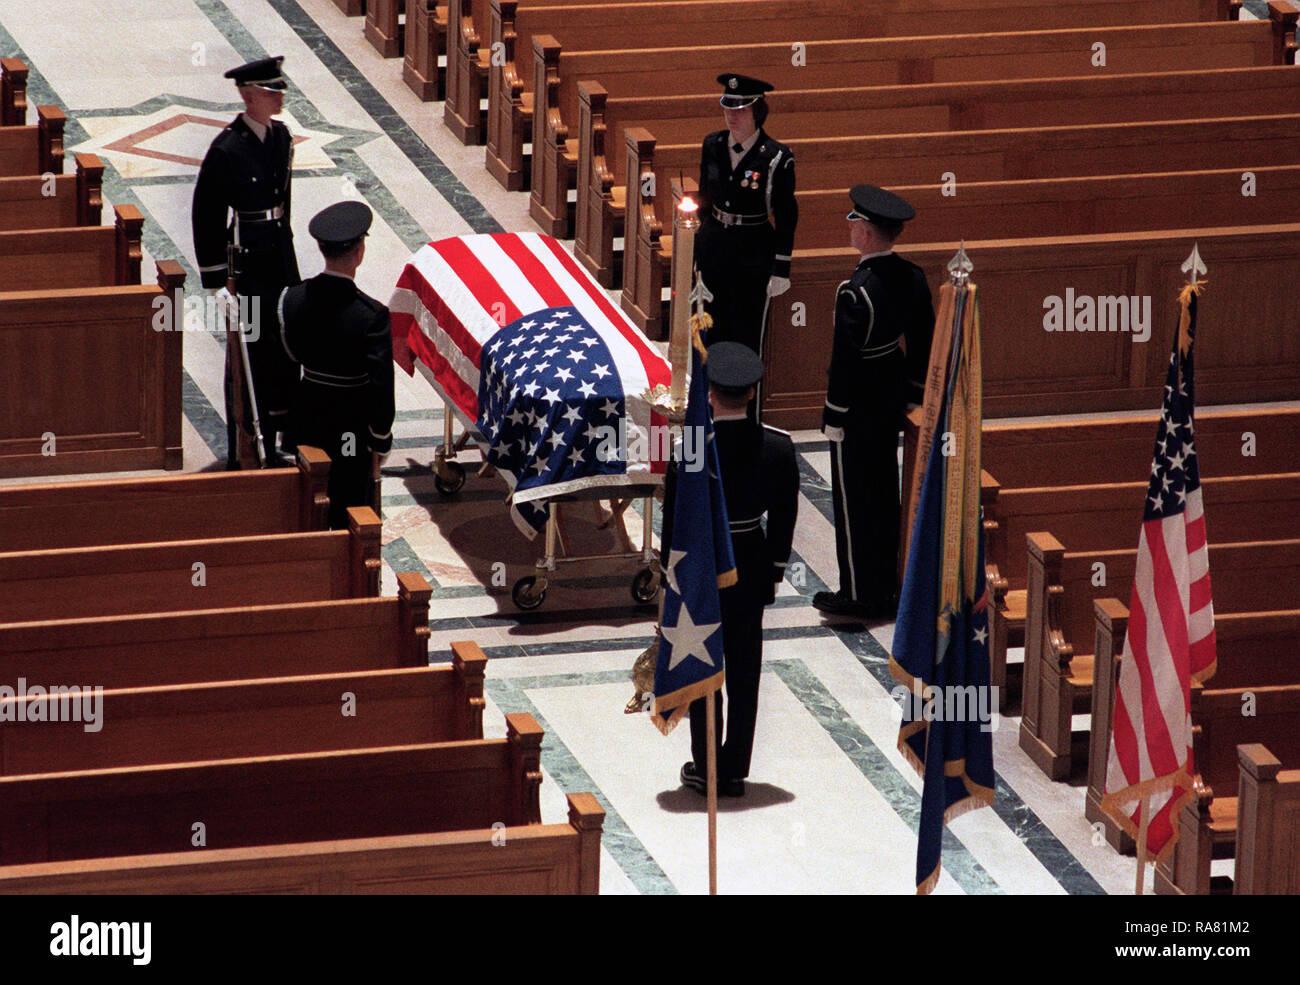 1978 - La Guardia de Honor los portadores del féretro pertenecen mira a la  urna en 3514010efdf